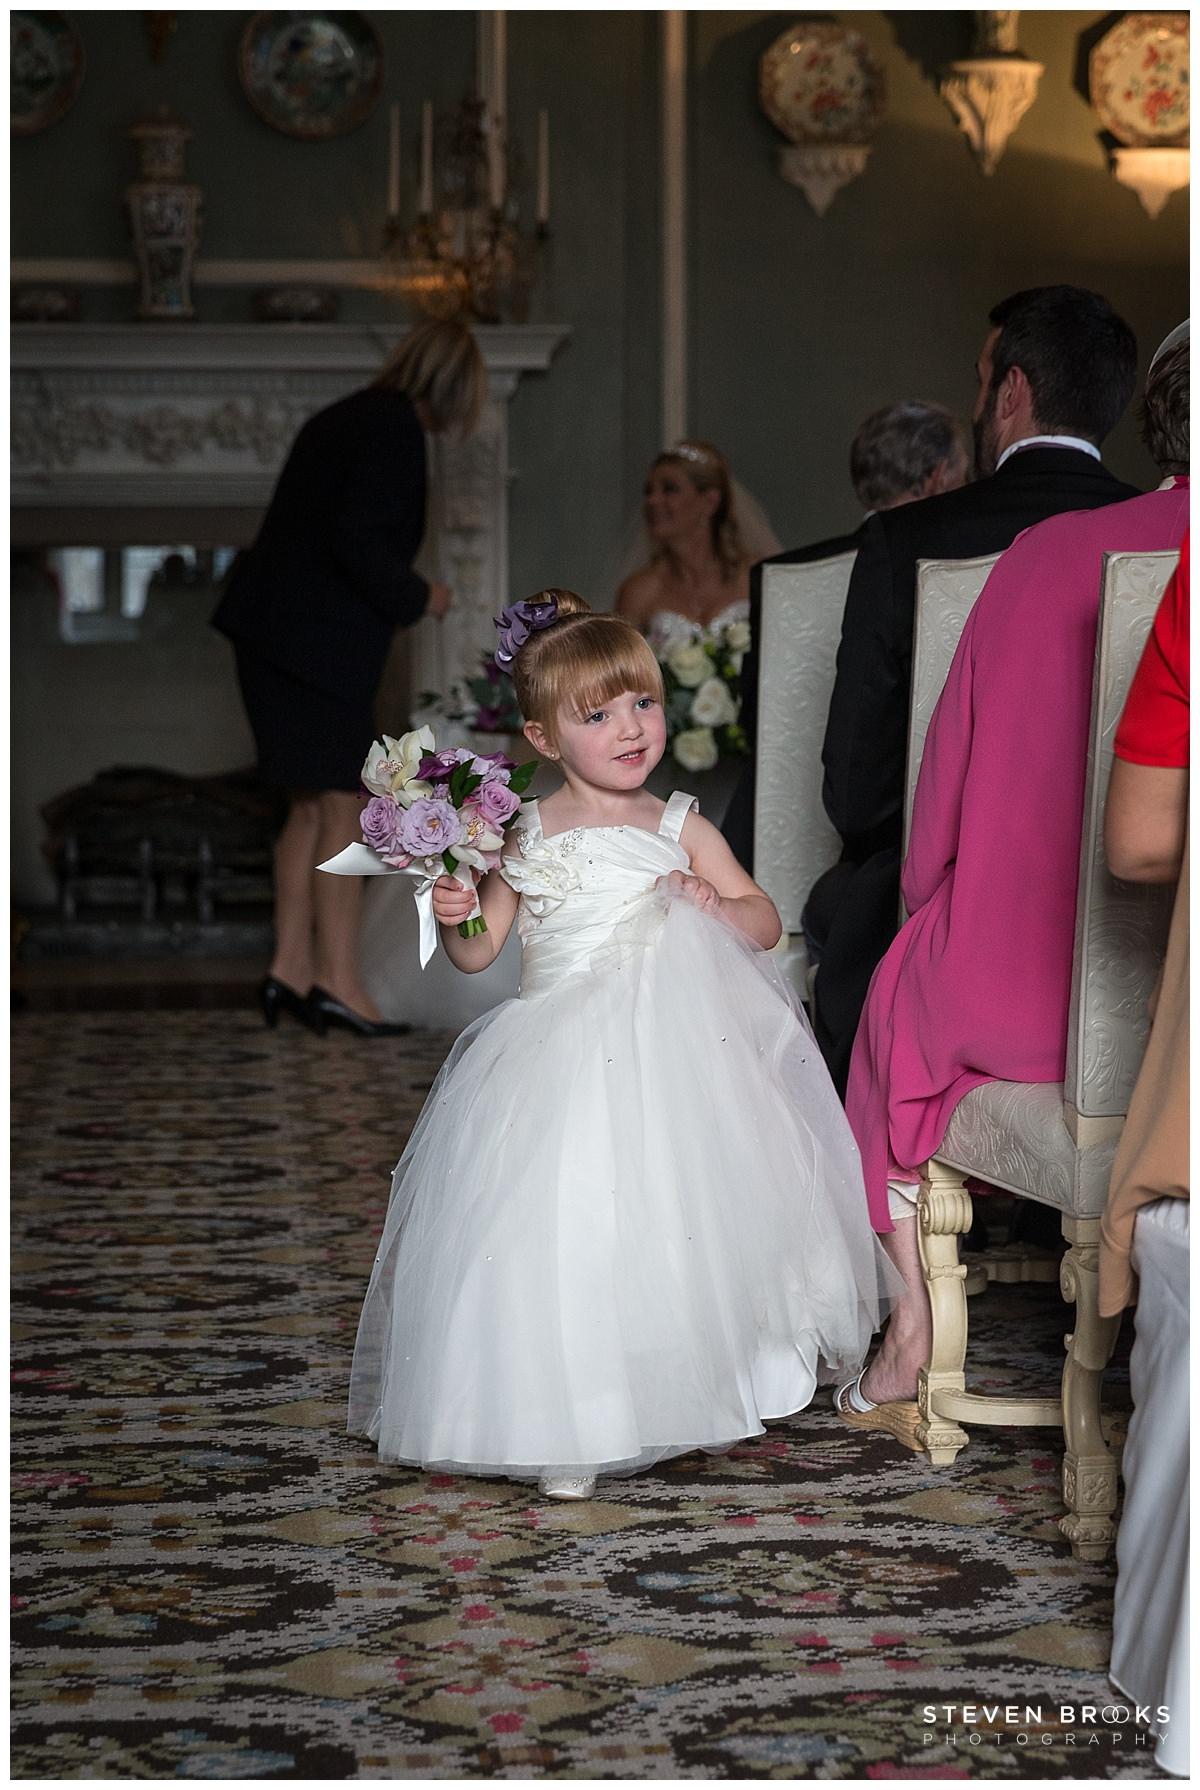 Leeds Castle wedding photographer steven brooks photographs a flower girl in the wedding ceremony room at Leeds Castle